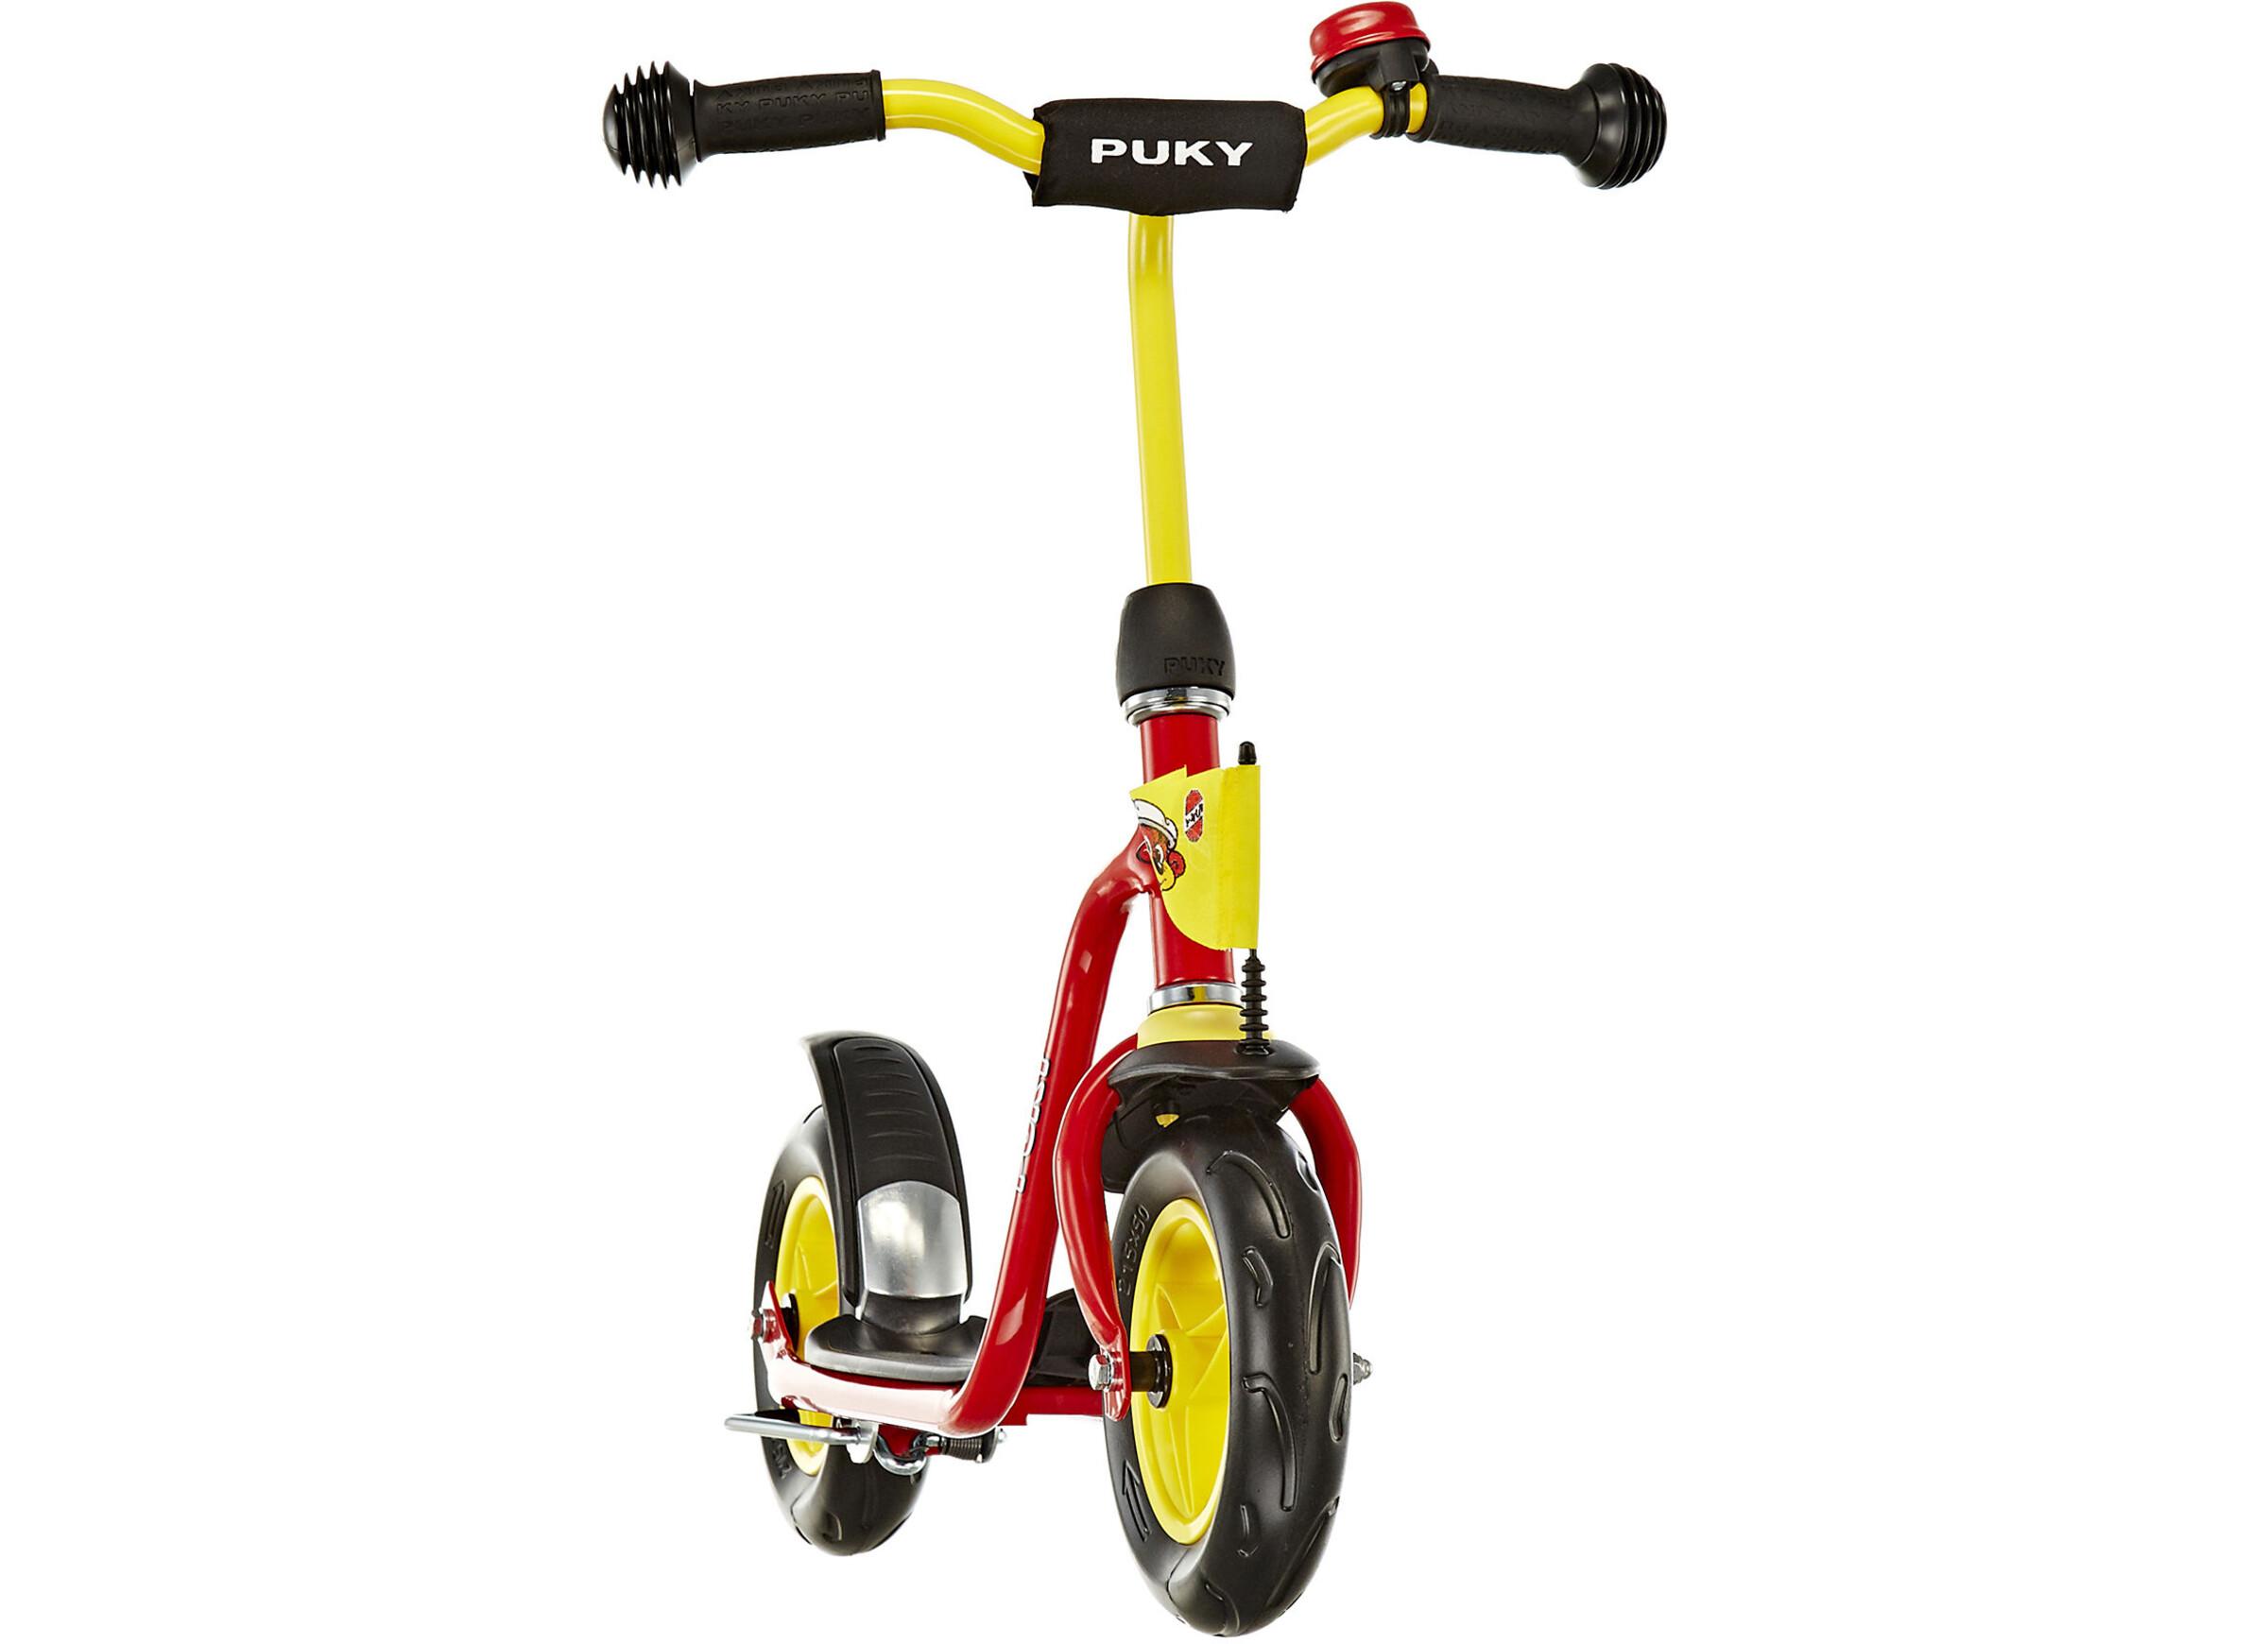 puky r03 scooter children red at. Black Bedroom Furniture Sets. Home Design Ideas